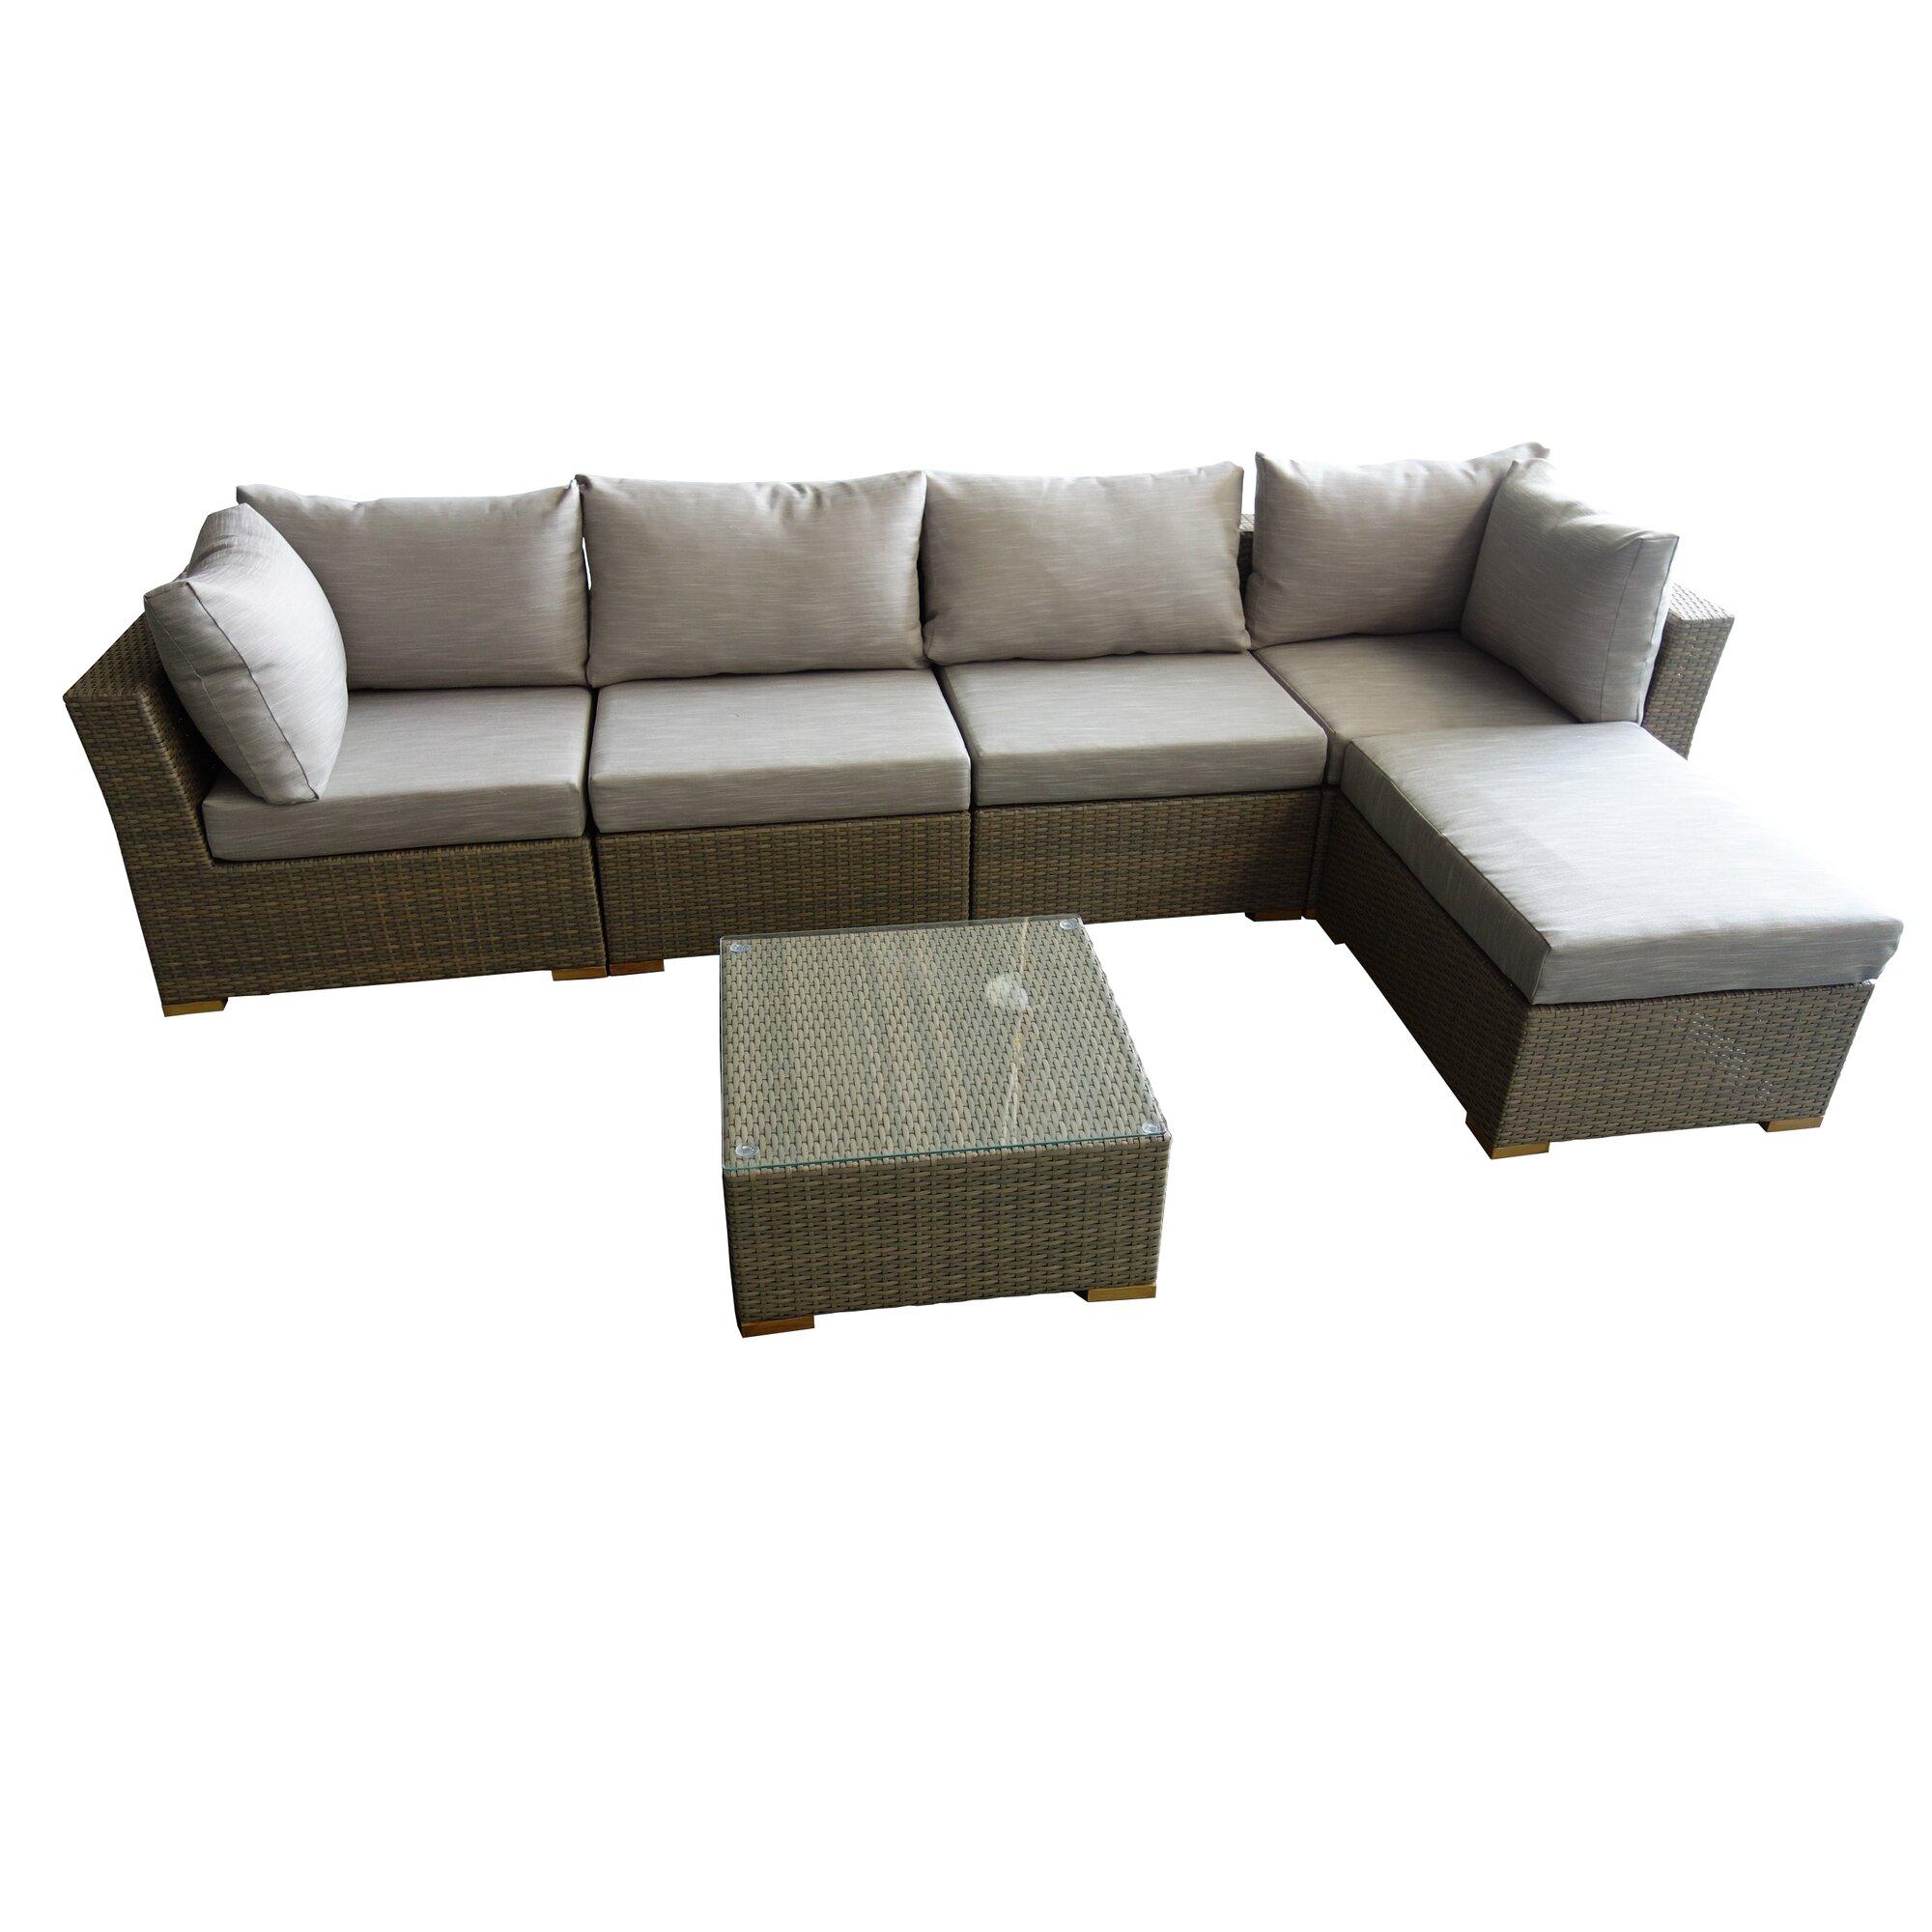 Signaturerattan maui 6 piece deep seating group with cushions wayfair ca